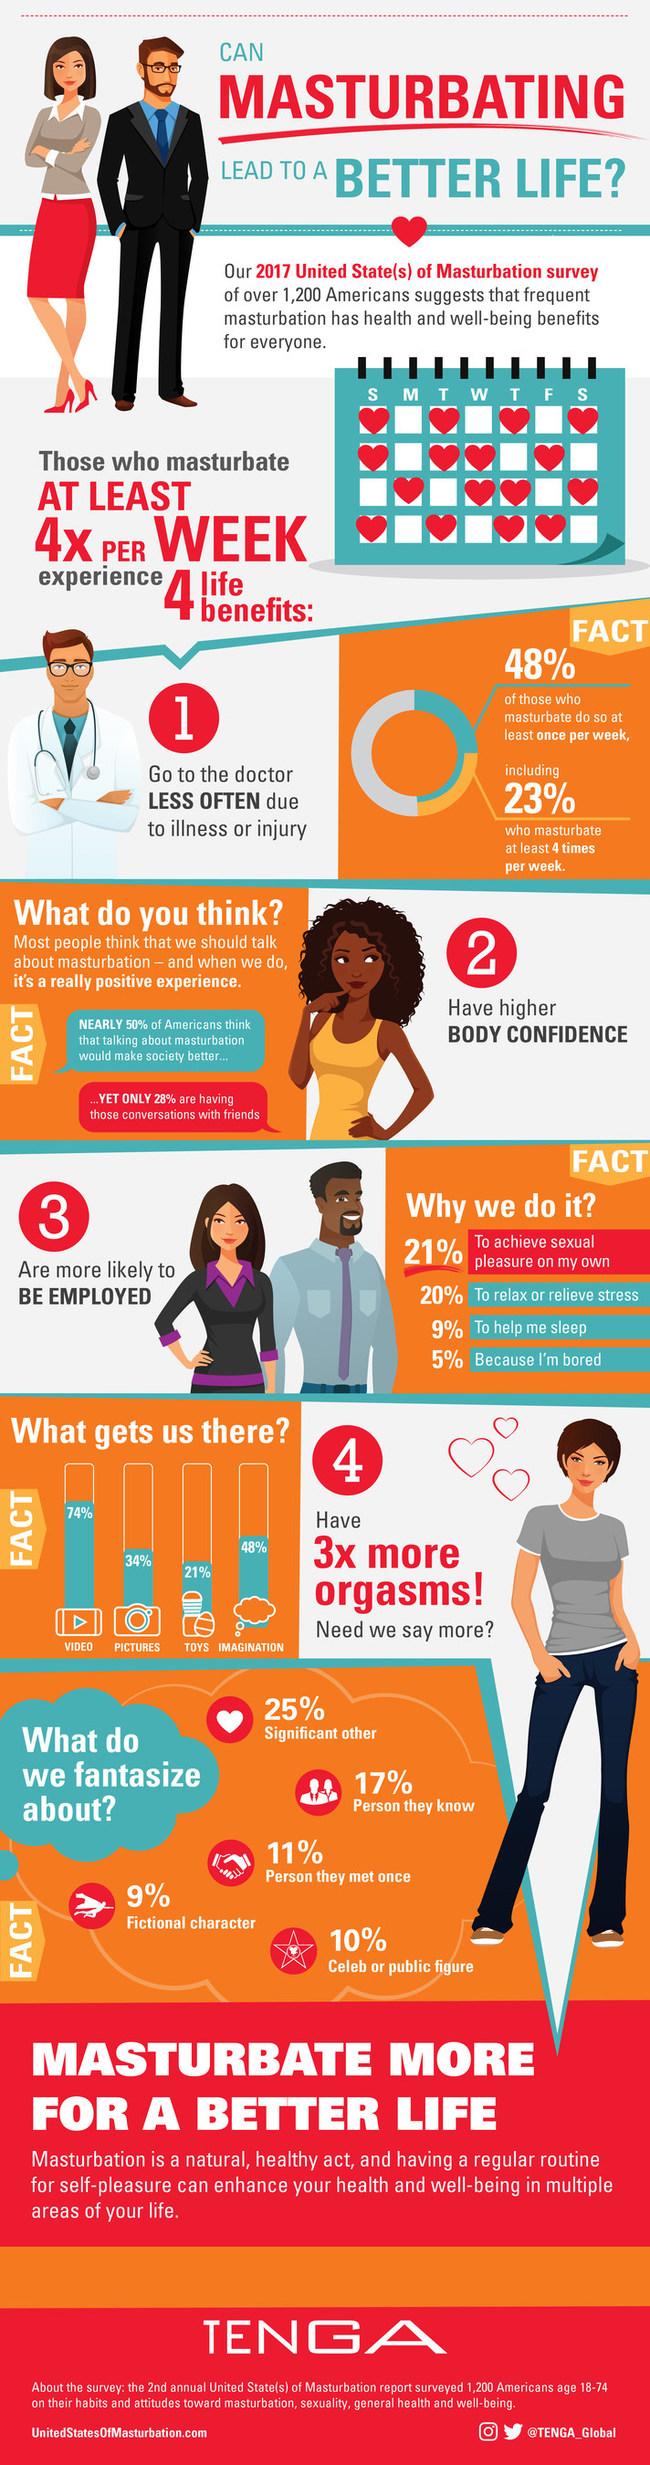 2017 survey results infographic (PRNewsfoto/TENGA Co. Ltd.)